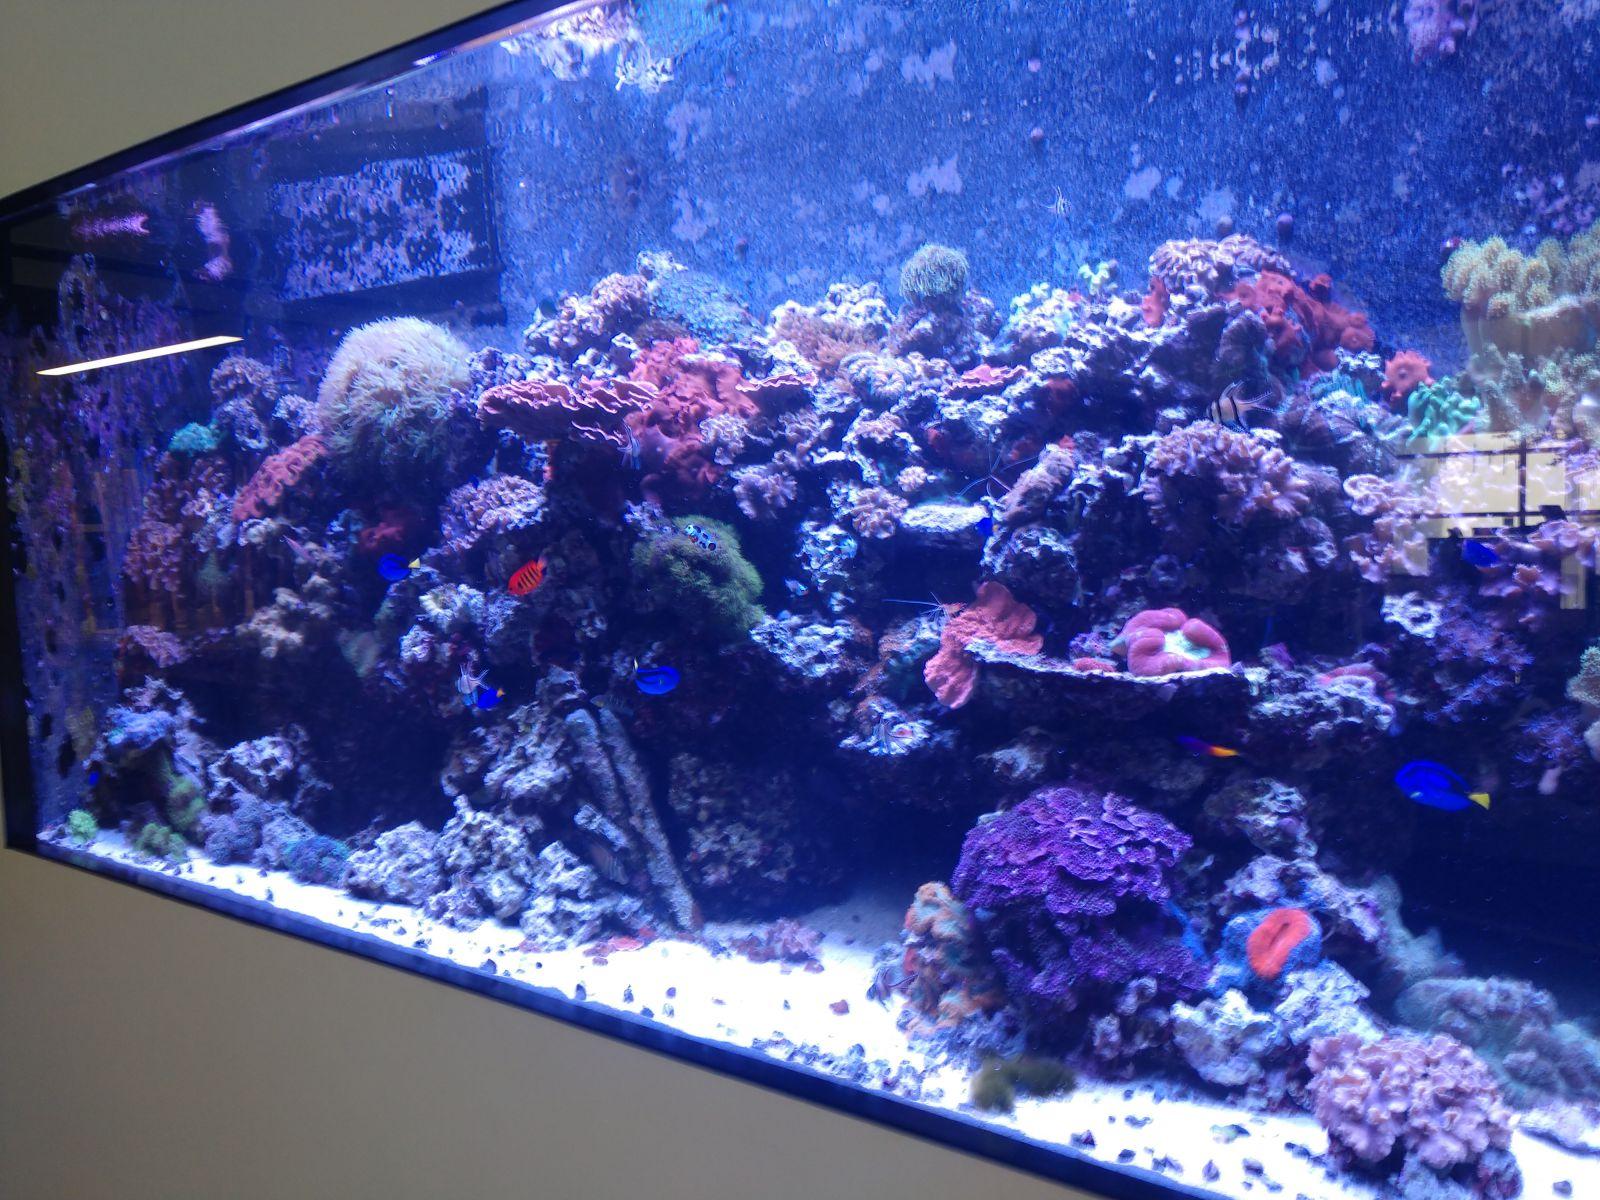 Aquarium Galleries From Fintastic In Charlotte NC